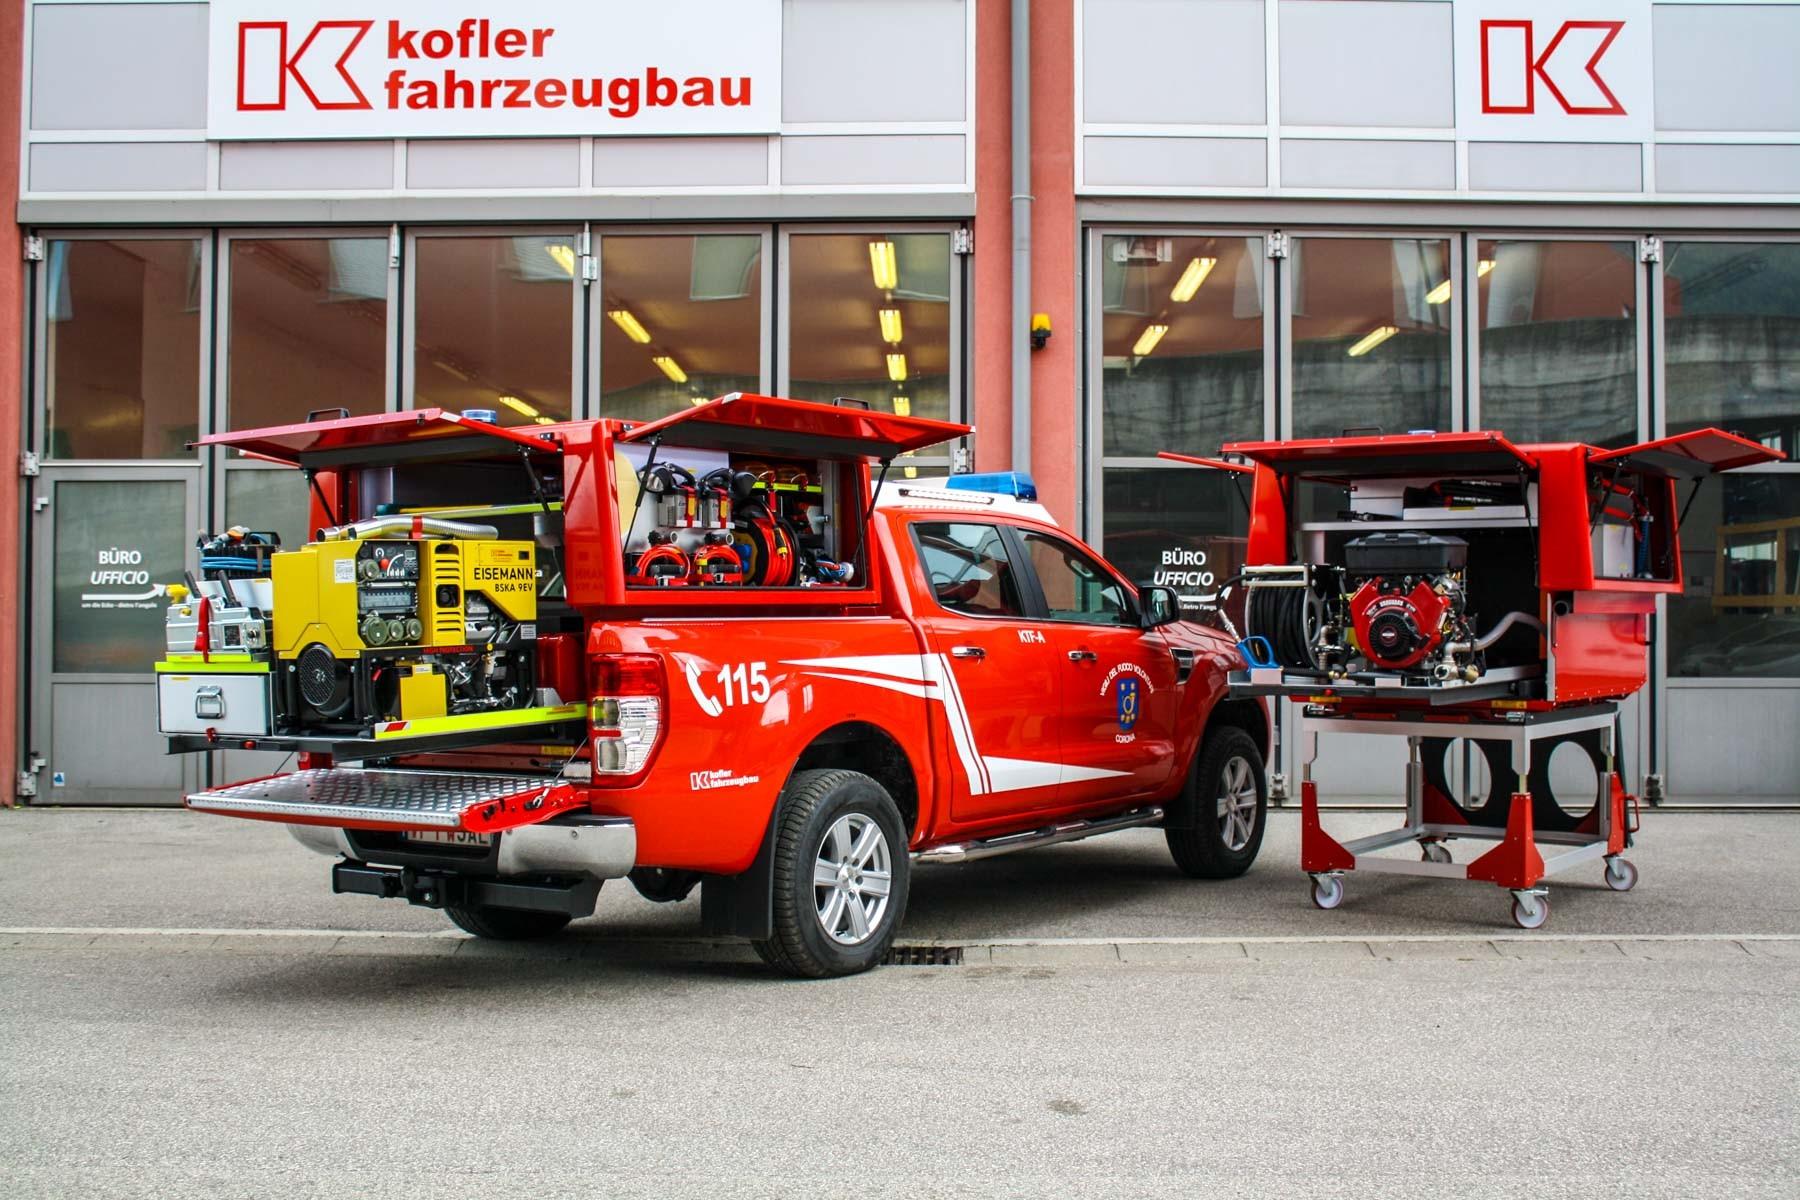 FF Graun Kurtatsch Kofler Fahrzeugbau